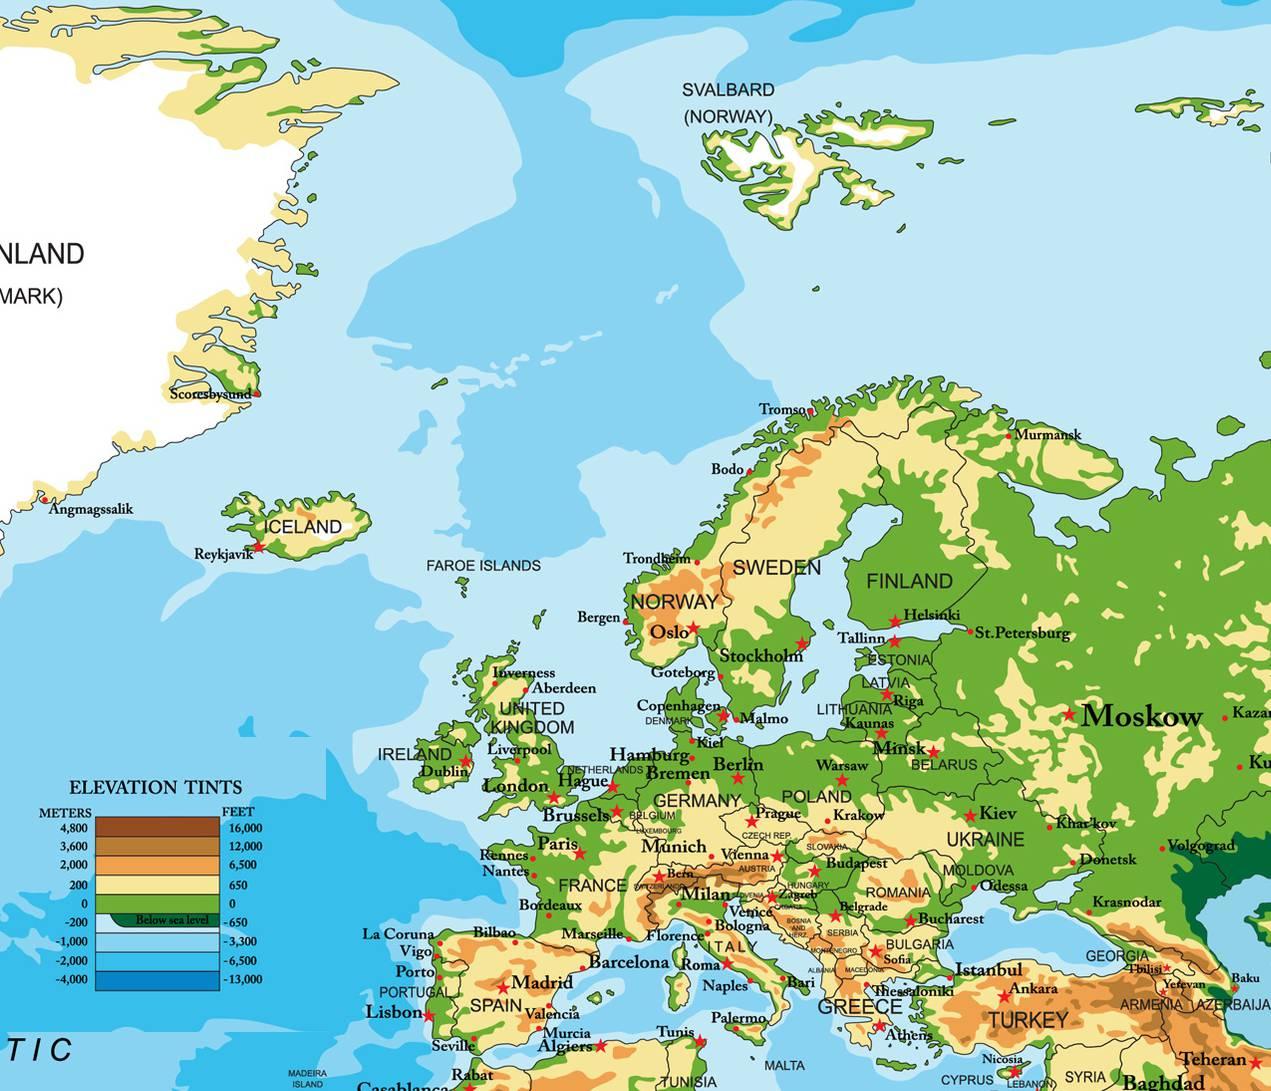 Carte De L'europe - Cartes Reliefs, Villes, Pays, Euro, Ue concernant Carte Europe Vierge